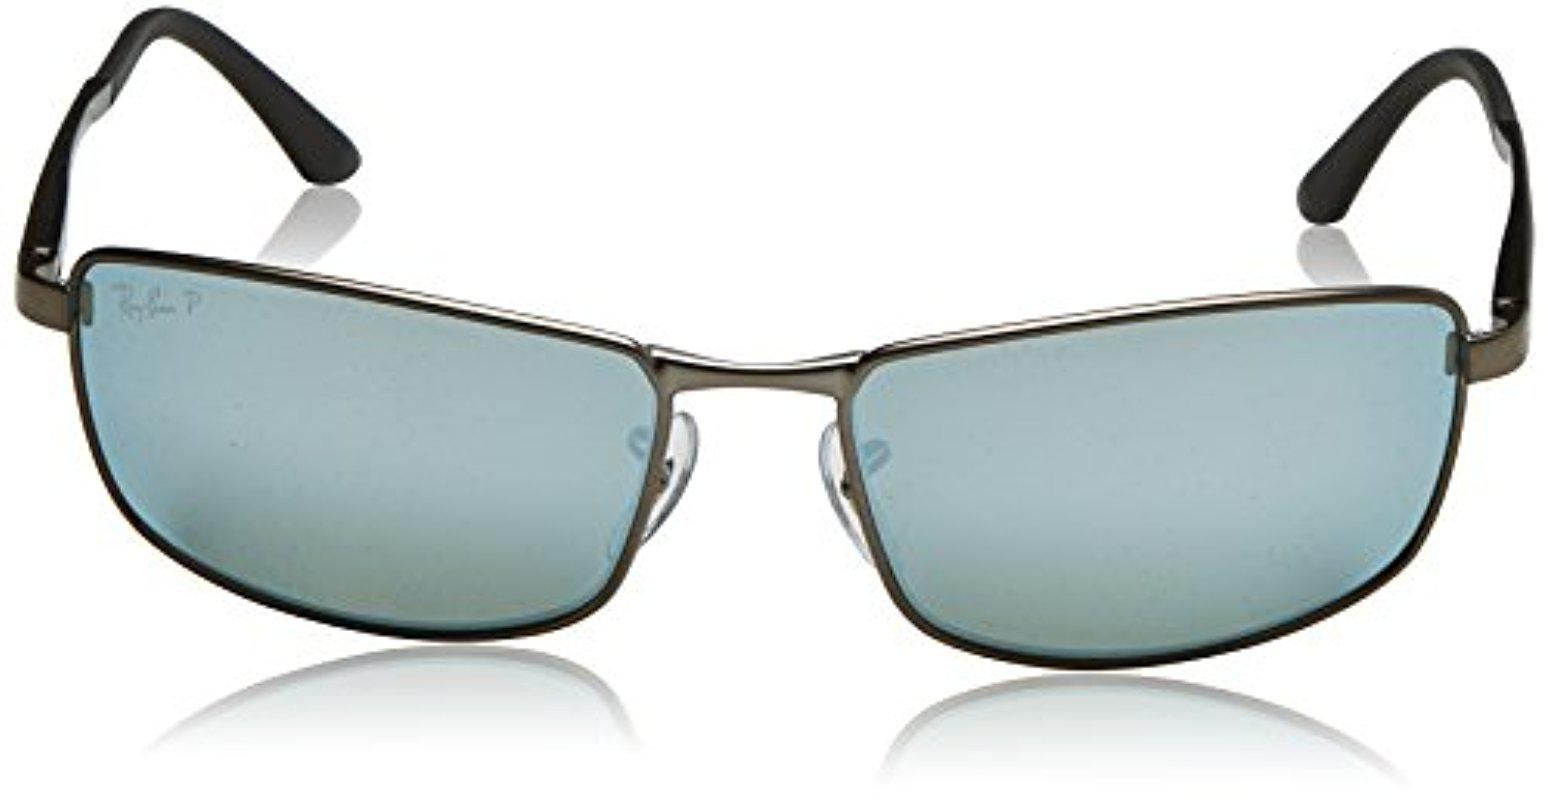 462668ad20b Ray-Ban - Multicolor Rb3498 029 y4 Polarized Sunglasses